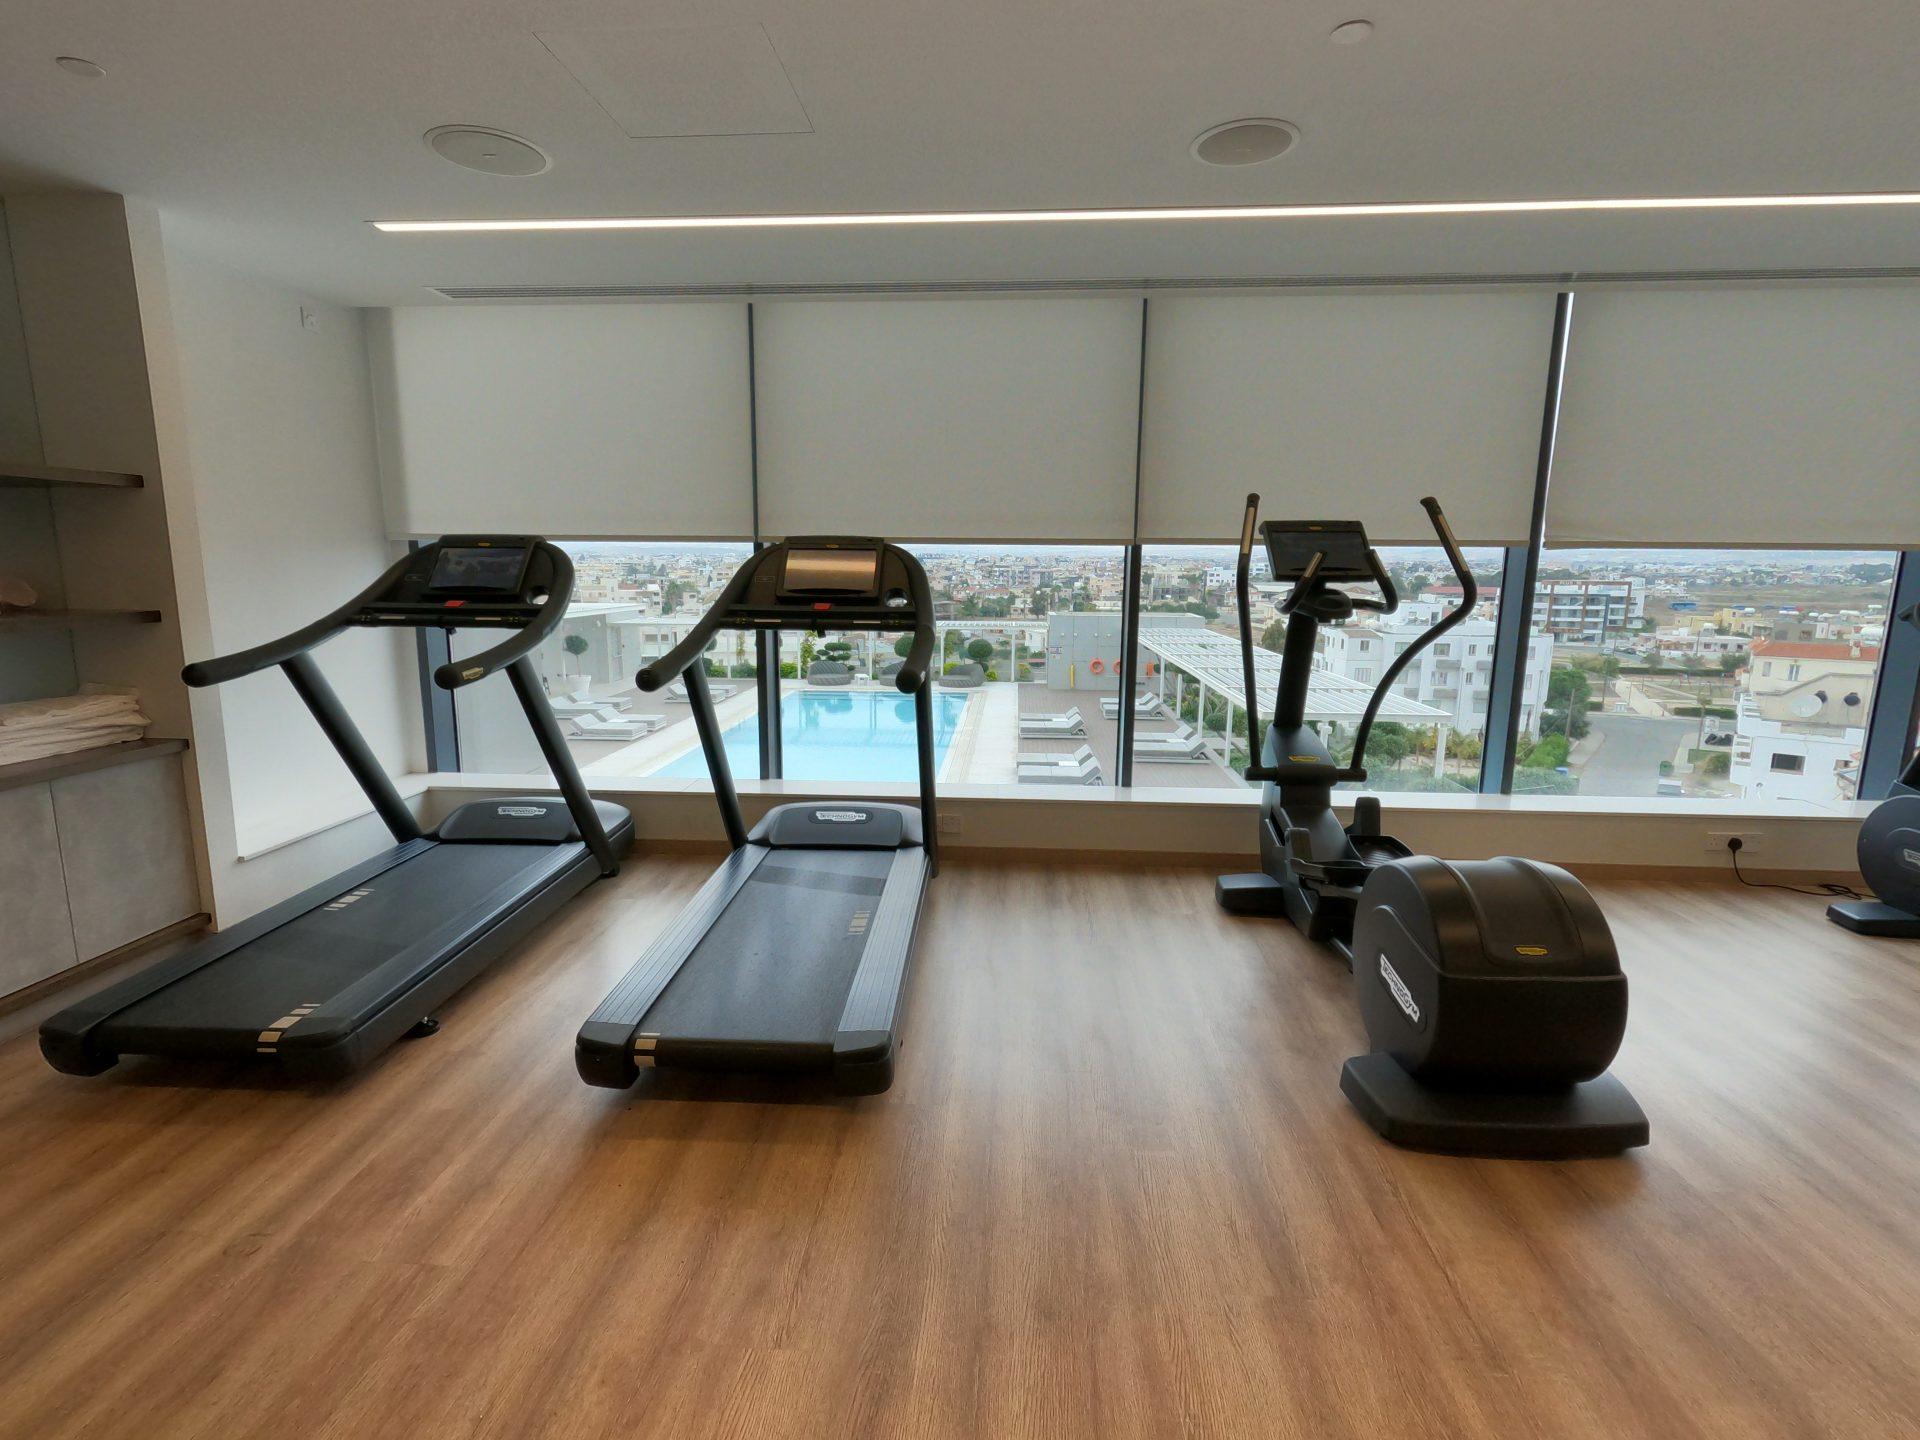 Professional TechnoGym treadmills